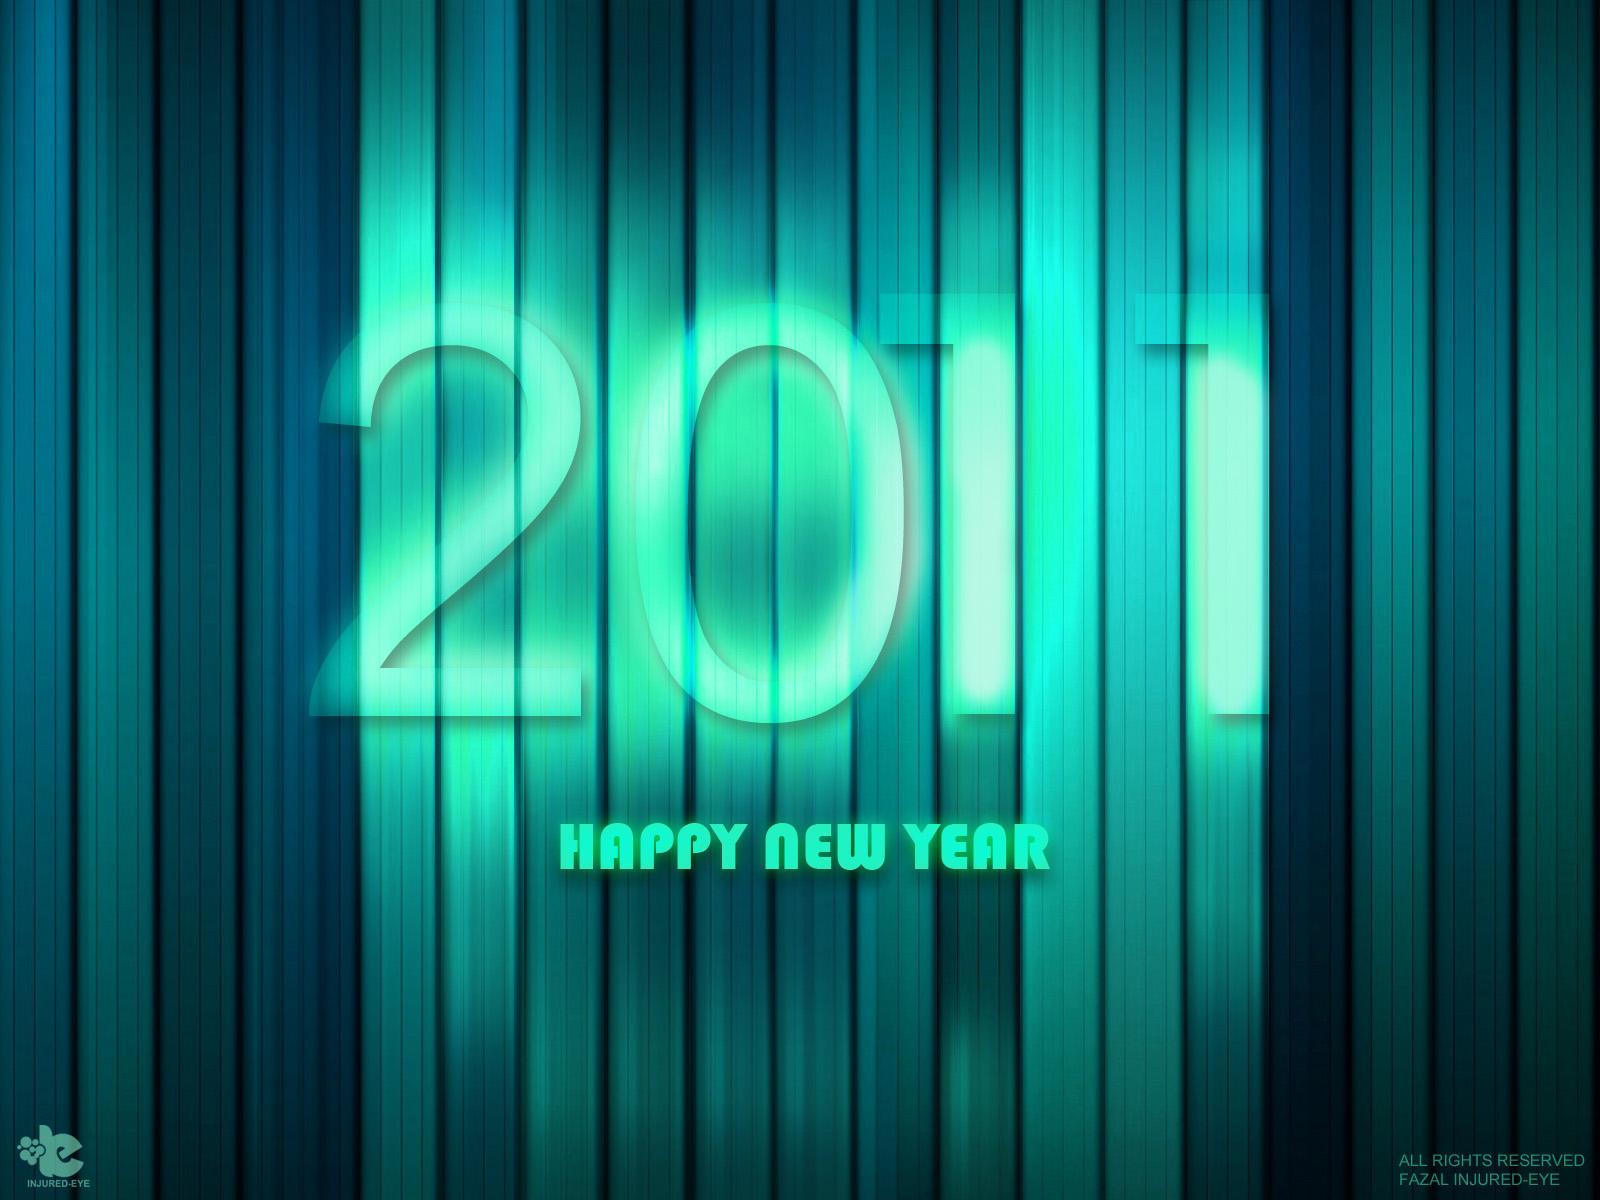 http://3.bp.blogspot.com/_8_CLn-I1Tfc/TRonwXpmerI/AAAAAAAAAHU/AZStRn5UzJw/s1600/new+year+2011.jpg